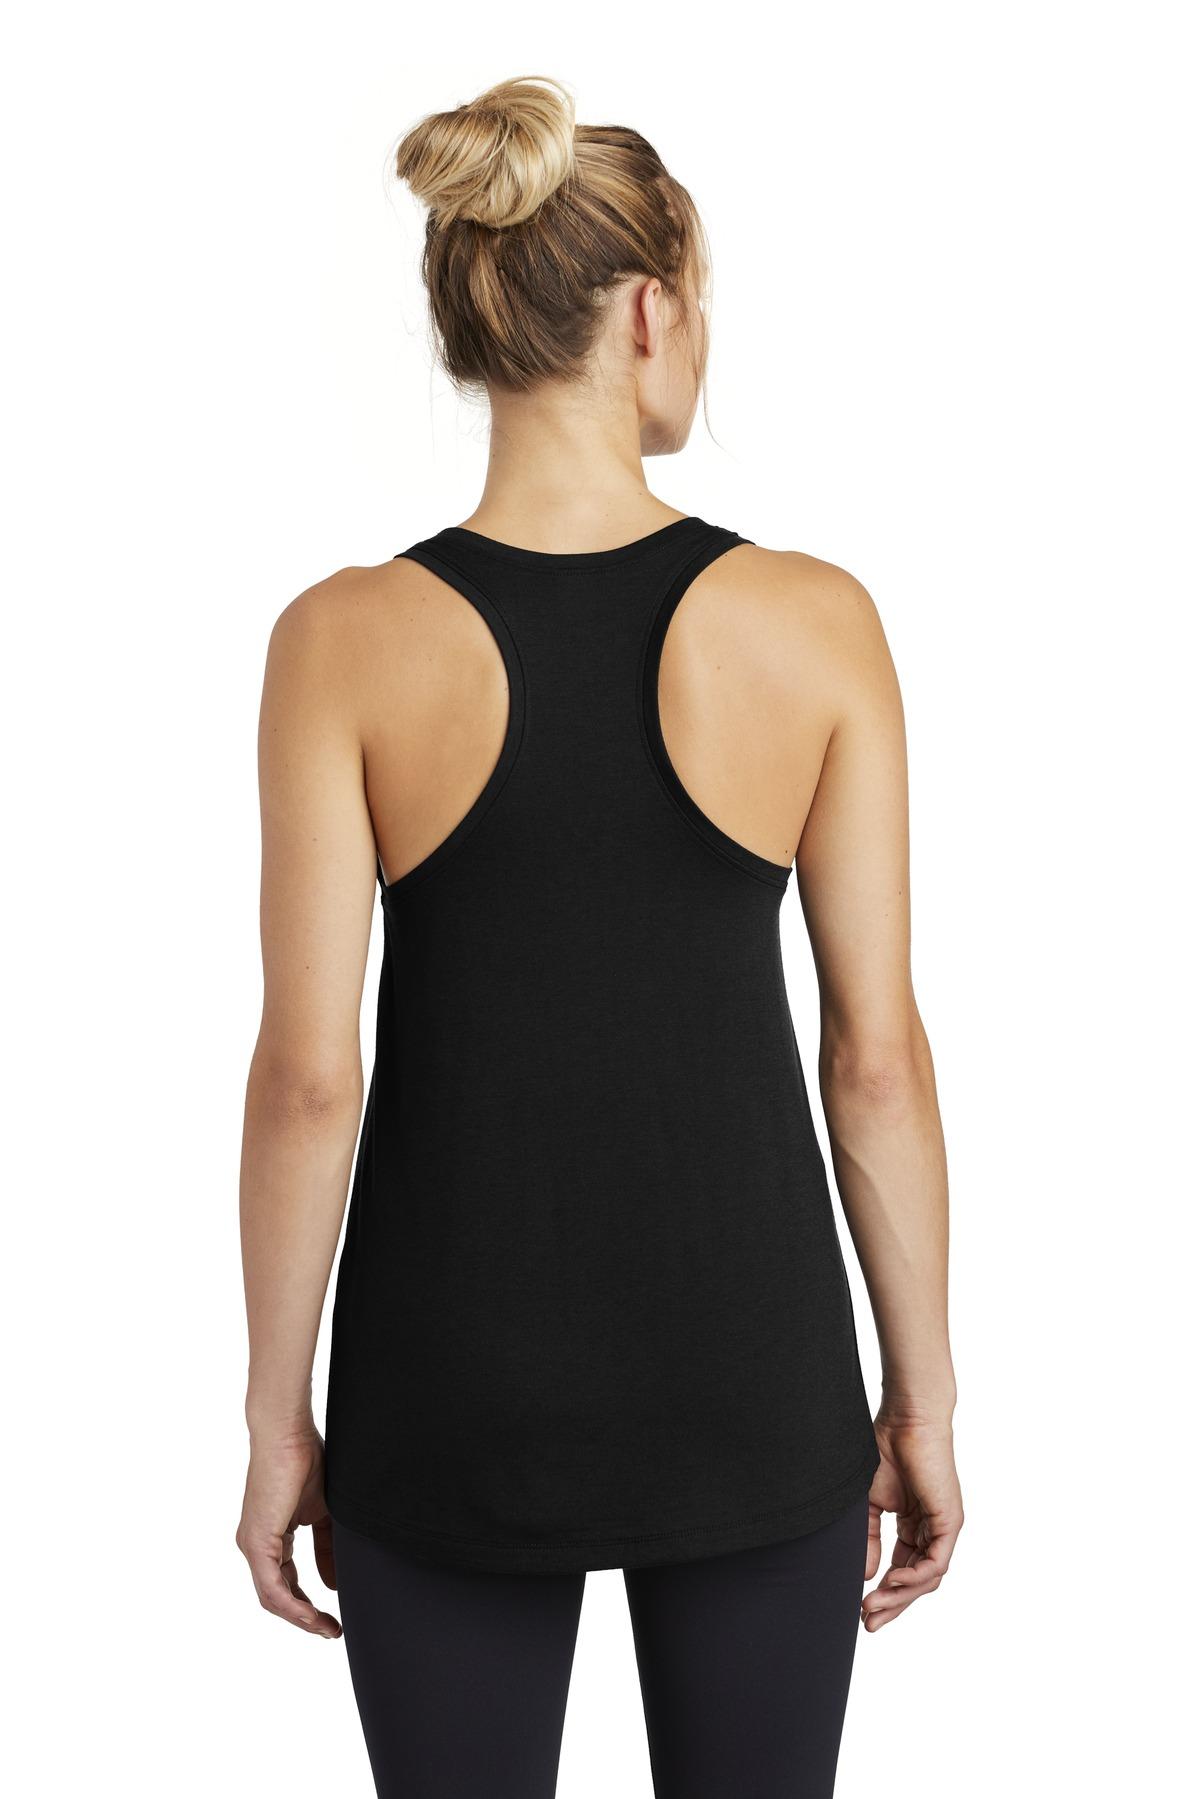 Sport Tek Ladies Posicharge Tri Blend Wicking Tank Lst402 Custom Shirt Shop Tangas in yoga pant ретвитнул(а). https csstacoma com product sport tek ladies posicharge tri blend wicking tank lst402